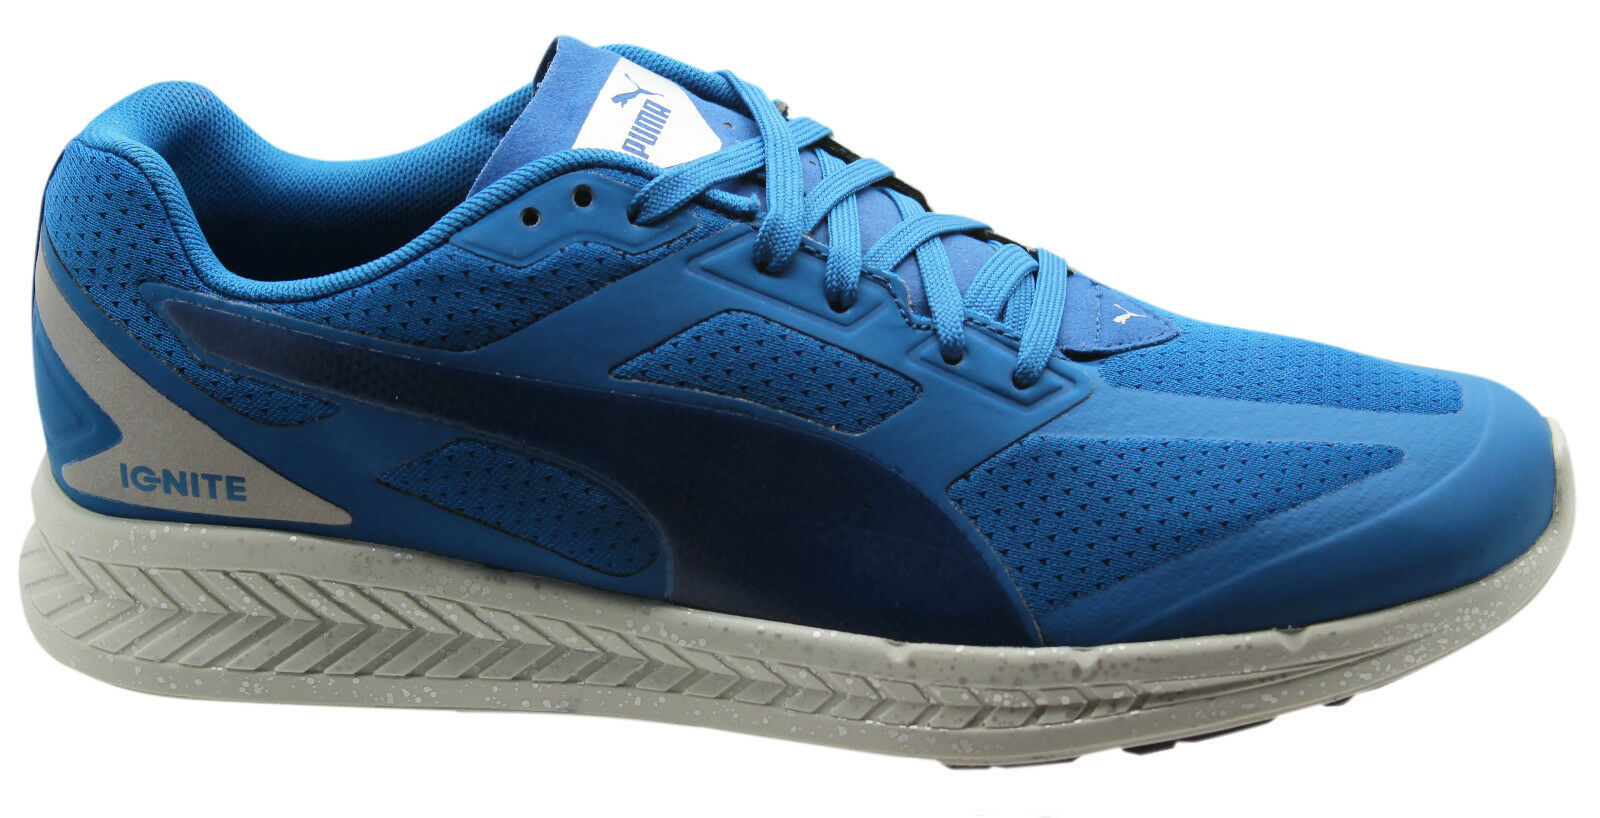 Puma Ignite Fast Forward Mens Trainers Running Shoes Unisex Sports ... 68e63303b